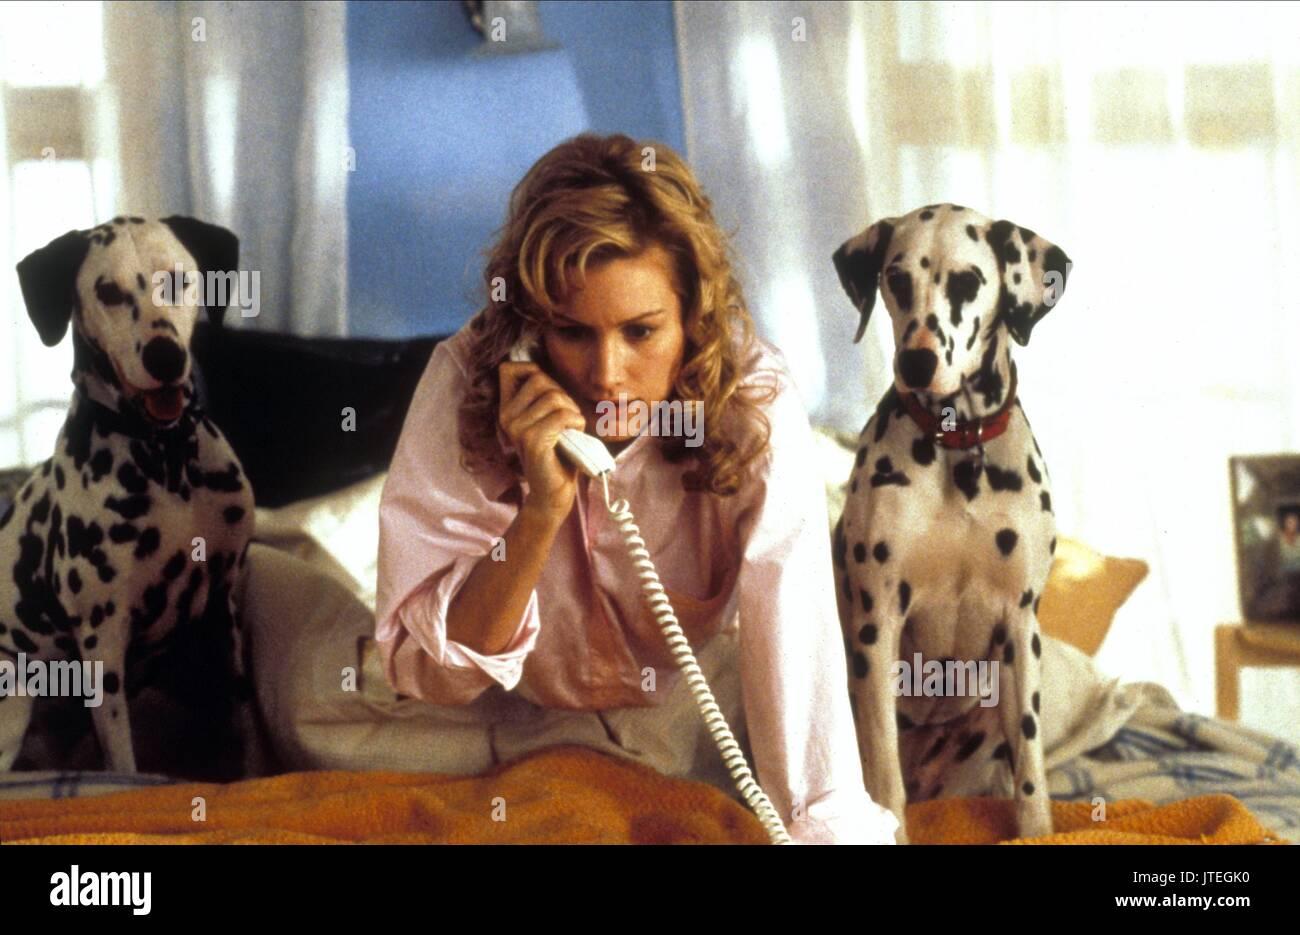 Alice Evans Dalmatians 102 Dalmatians 2000 Stock Photo Alamy